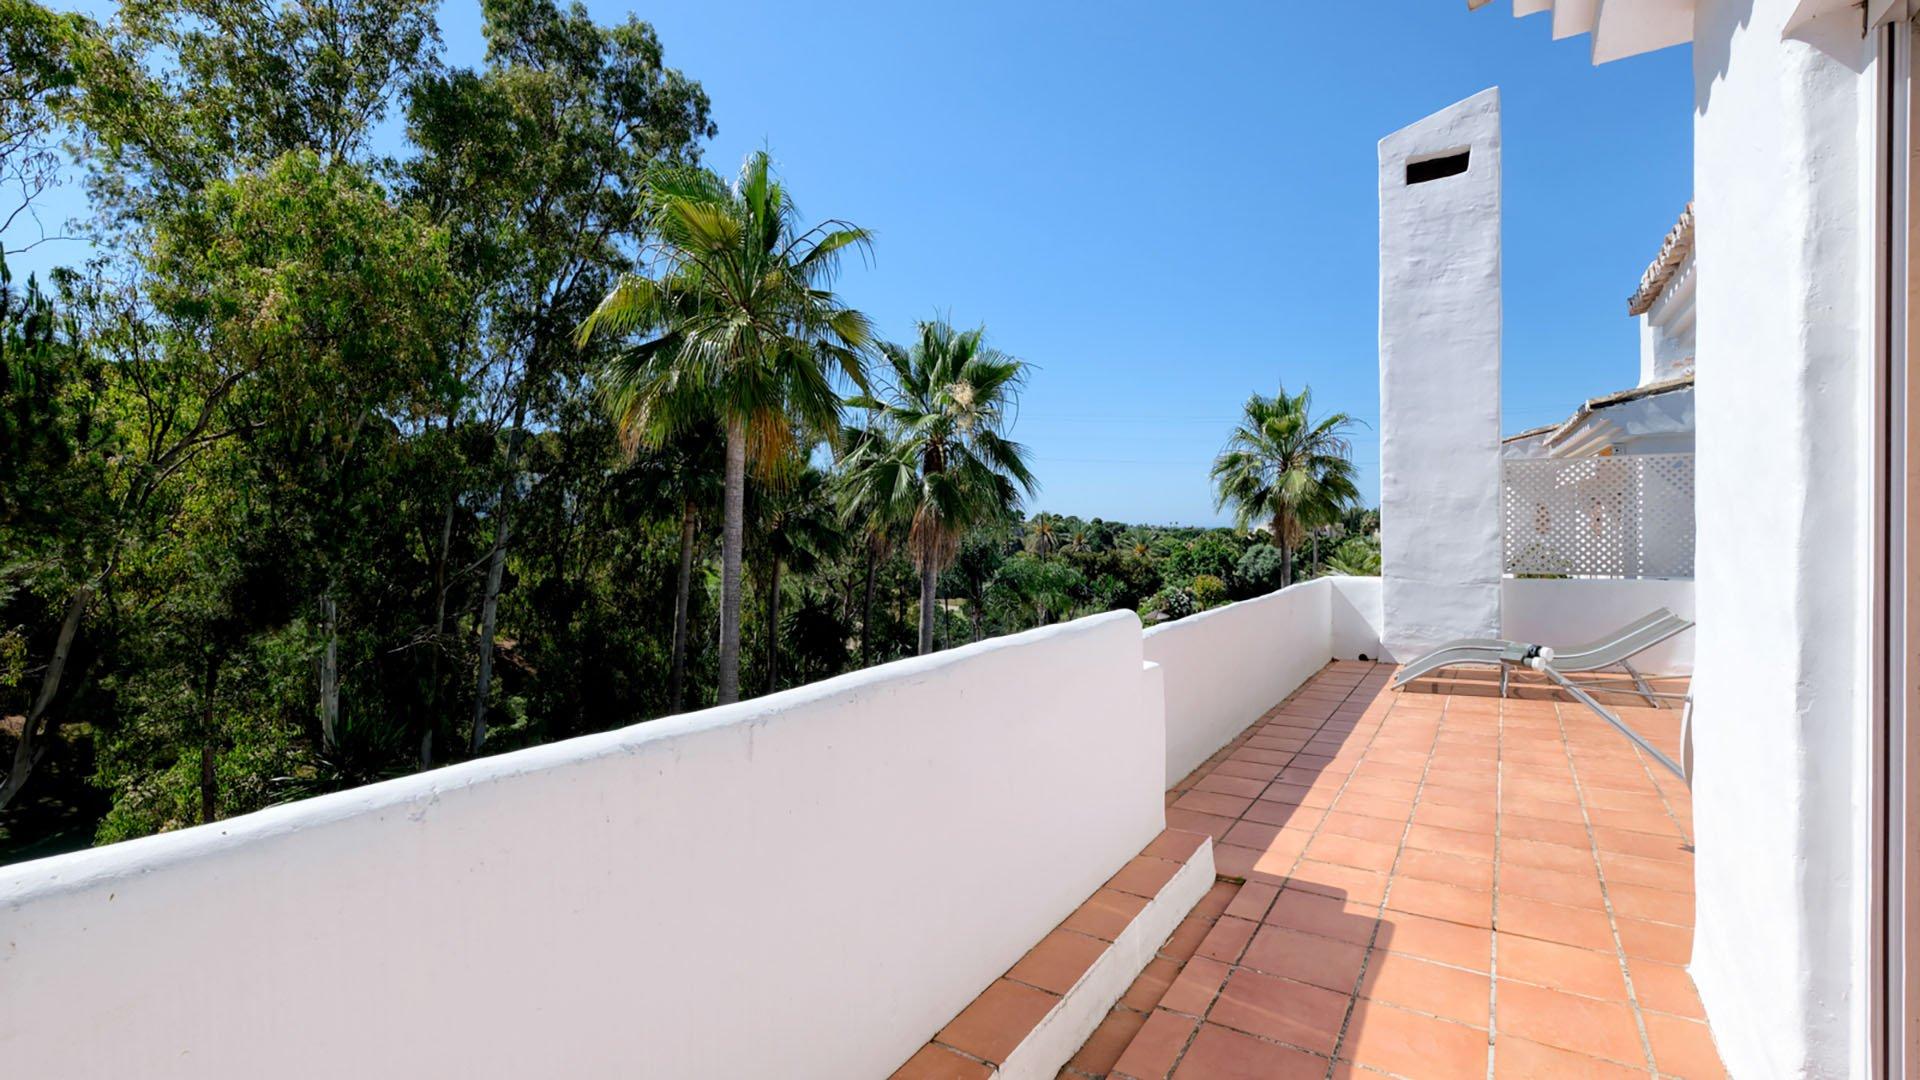 El Soto de La Quinta: Duplex penthouse in Benahavís, La Quinta